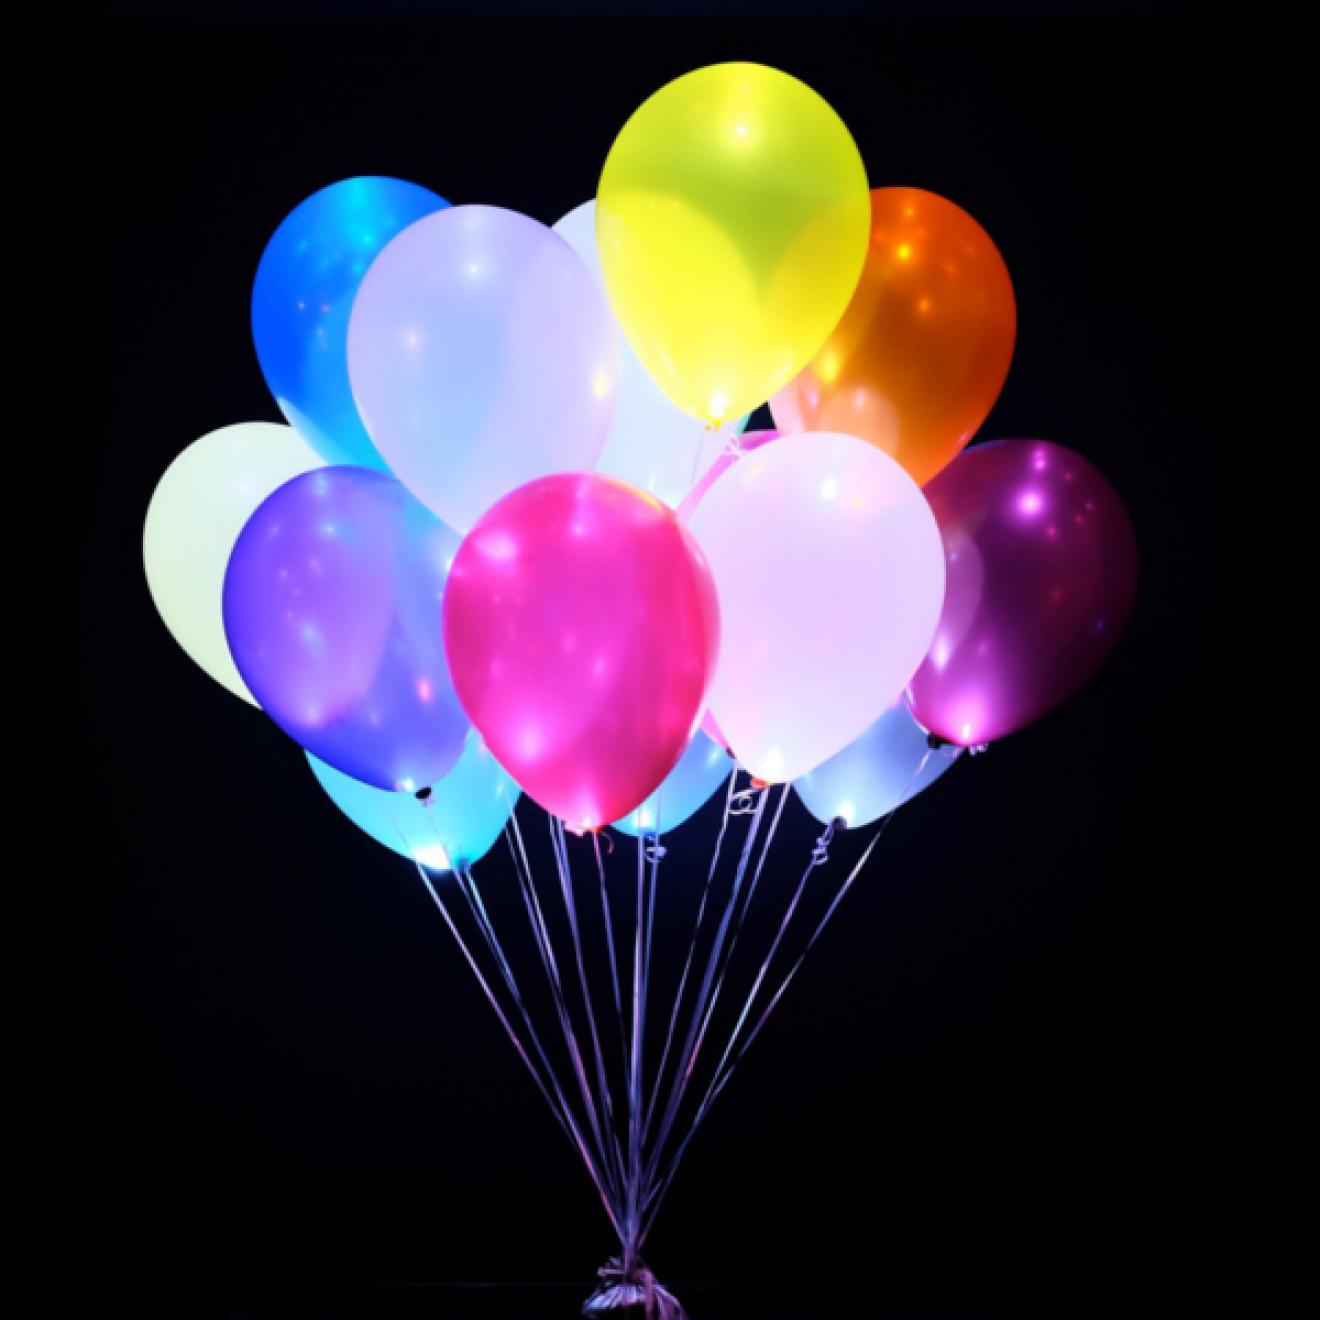 led dekolichter wei luftballons freie farbauswahl 30 cm. Black Bedroom Furniture Sets. Home Design Ideas